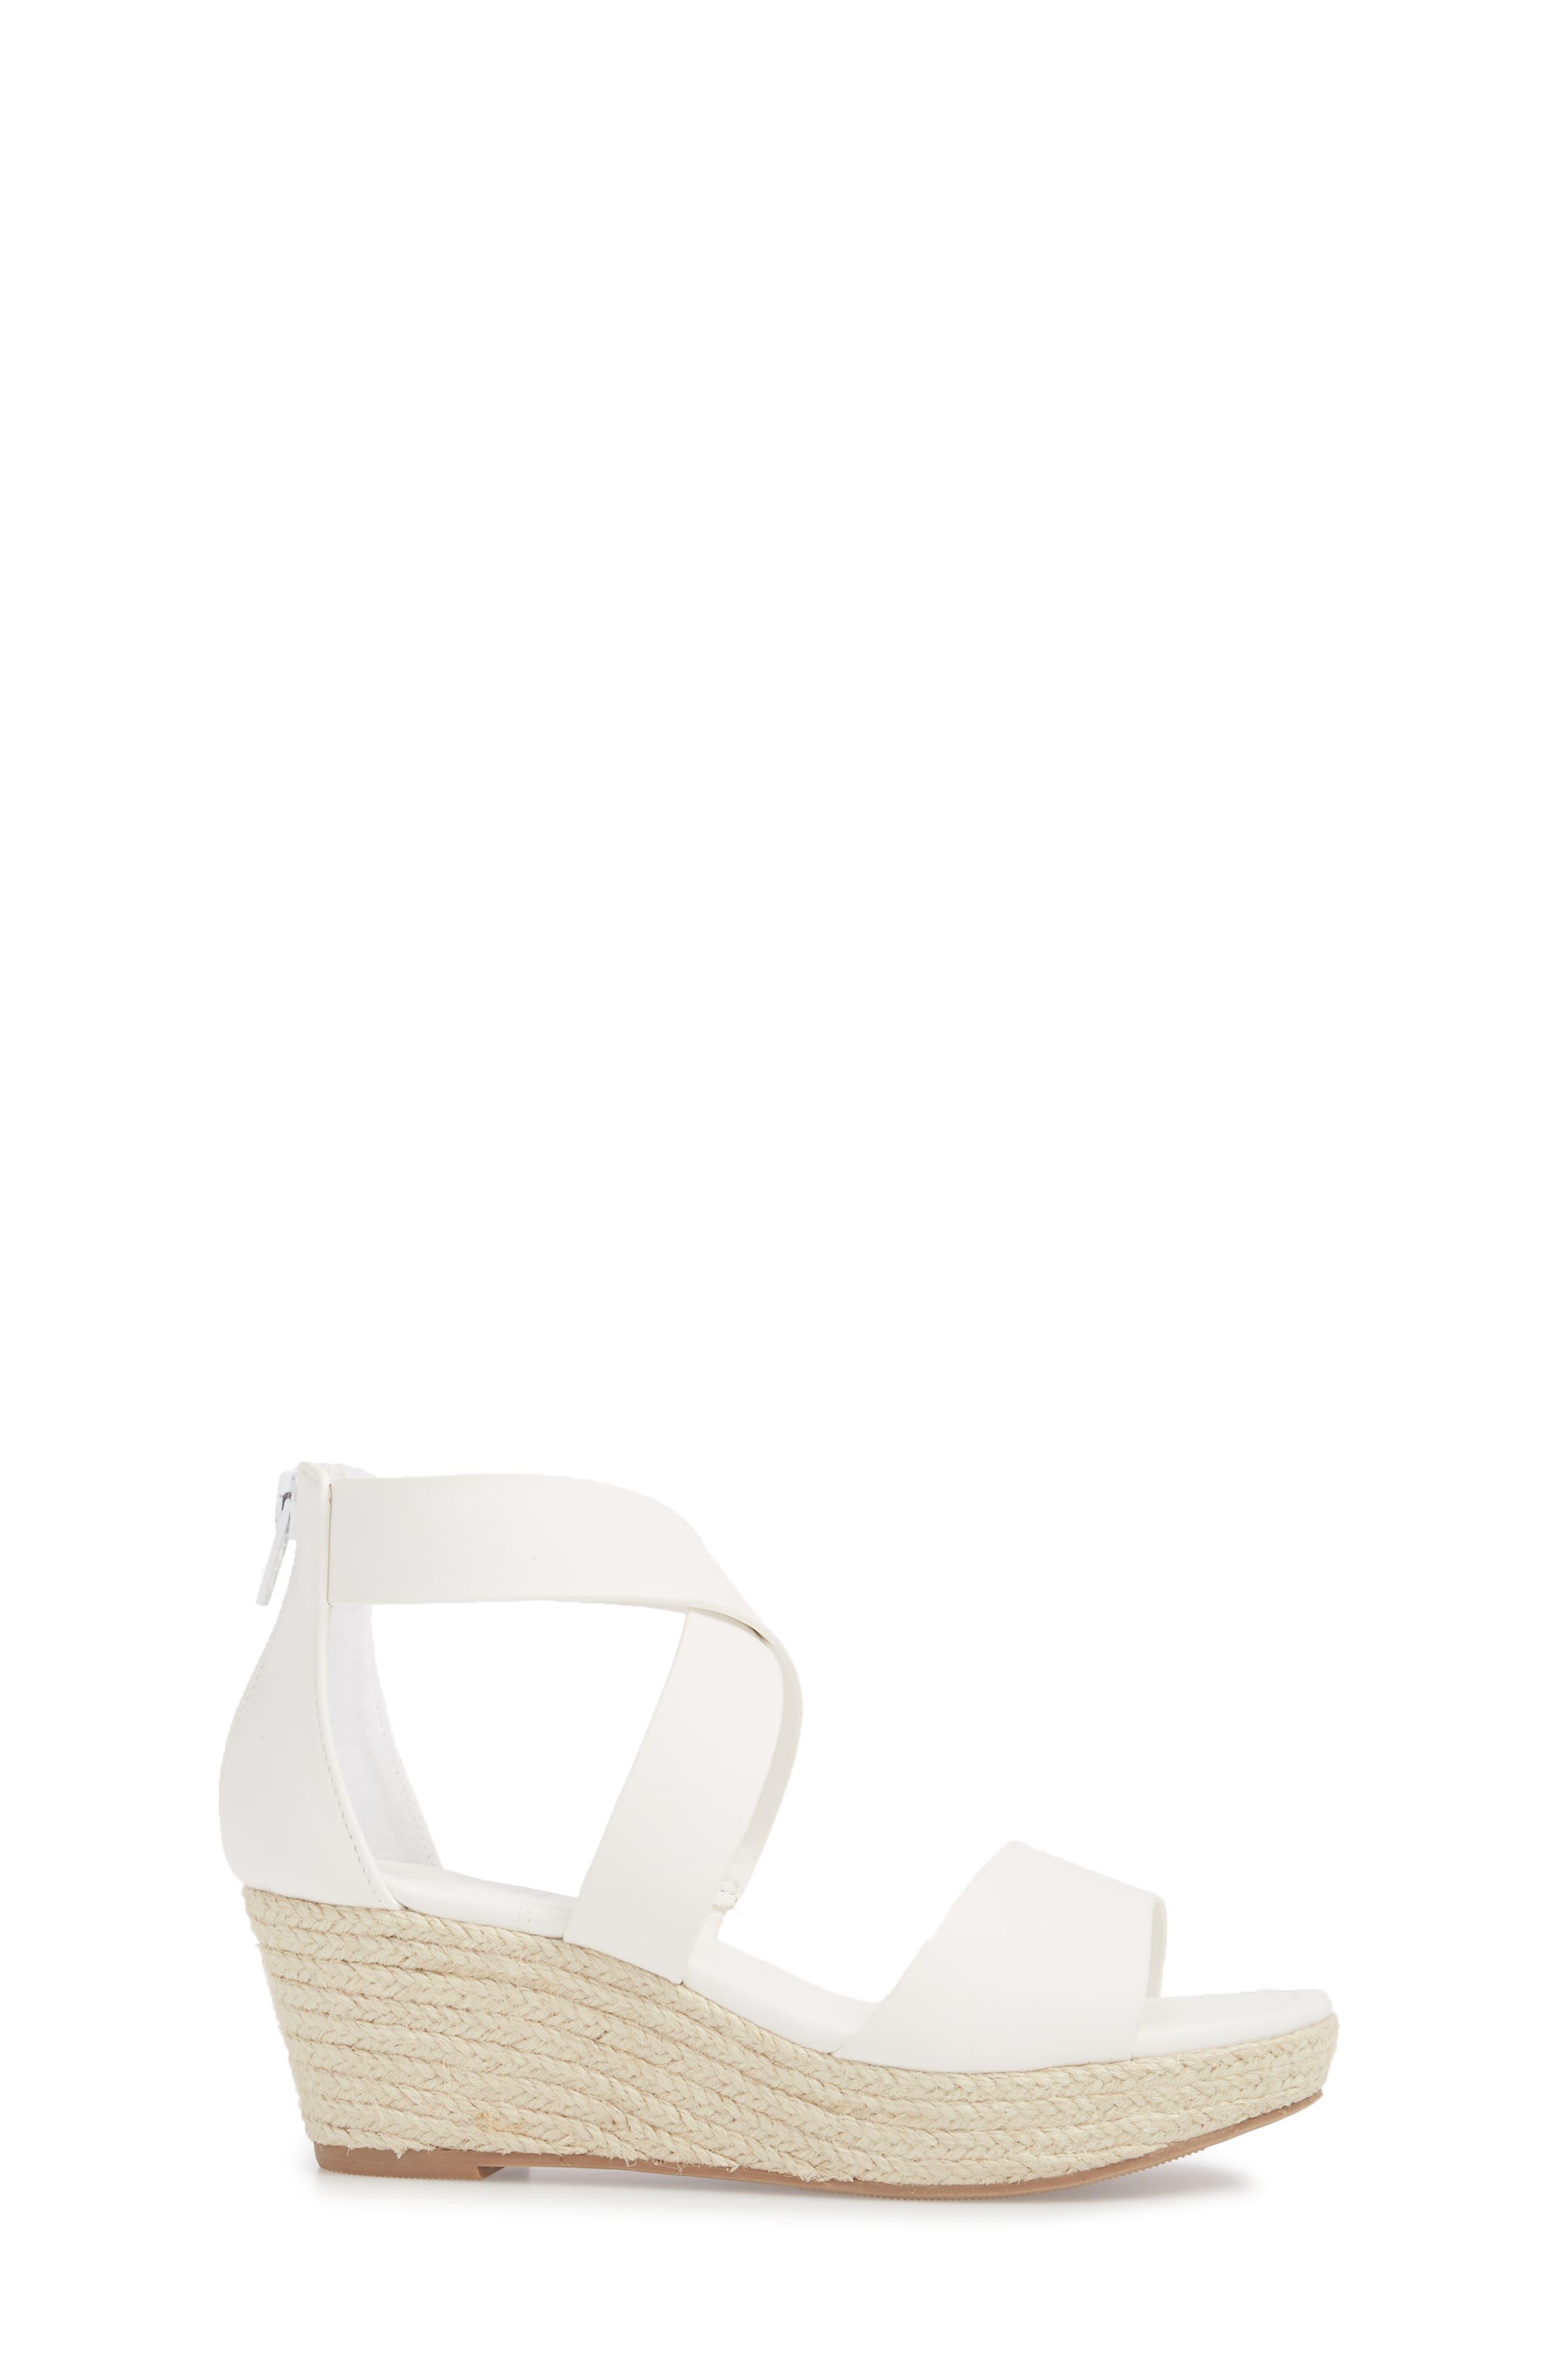 Wilma Platform Wedge Sandal,                             Alternate thumbnail 3, color,                             White